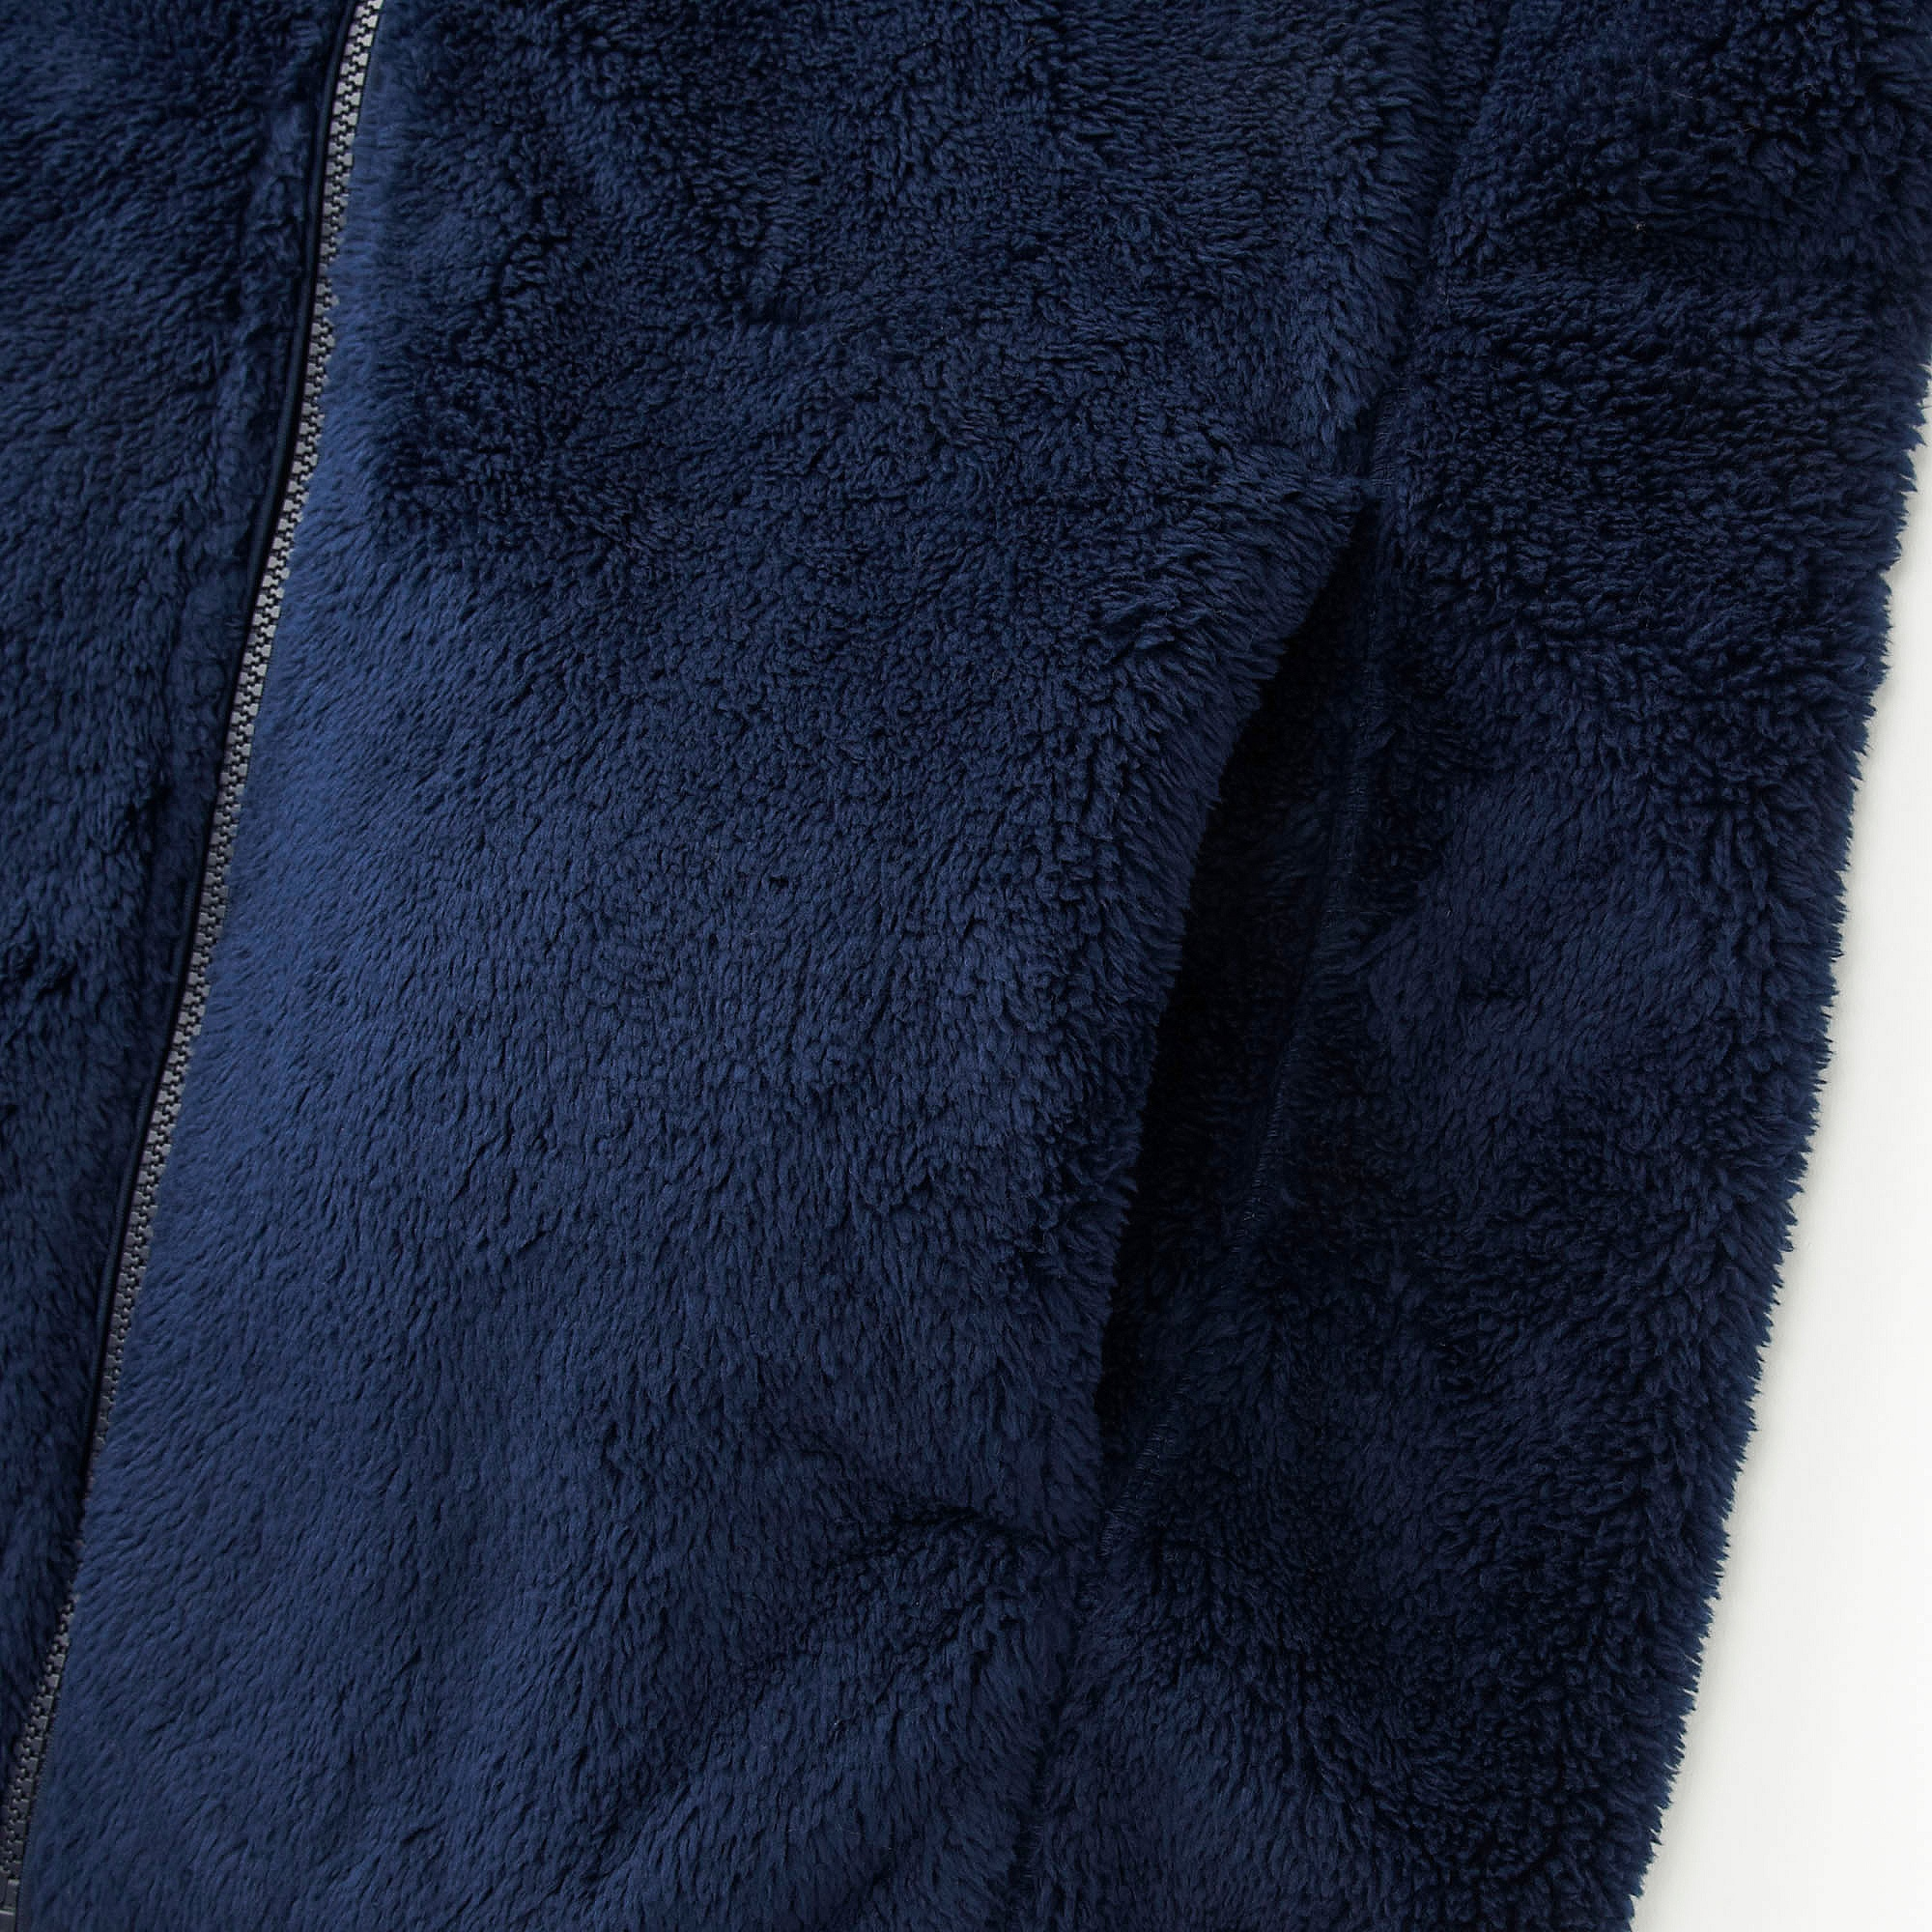 Uniqlo Men Fluffy Yarn Fleece Full Zip Jacket At 19 9 Love The Brands